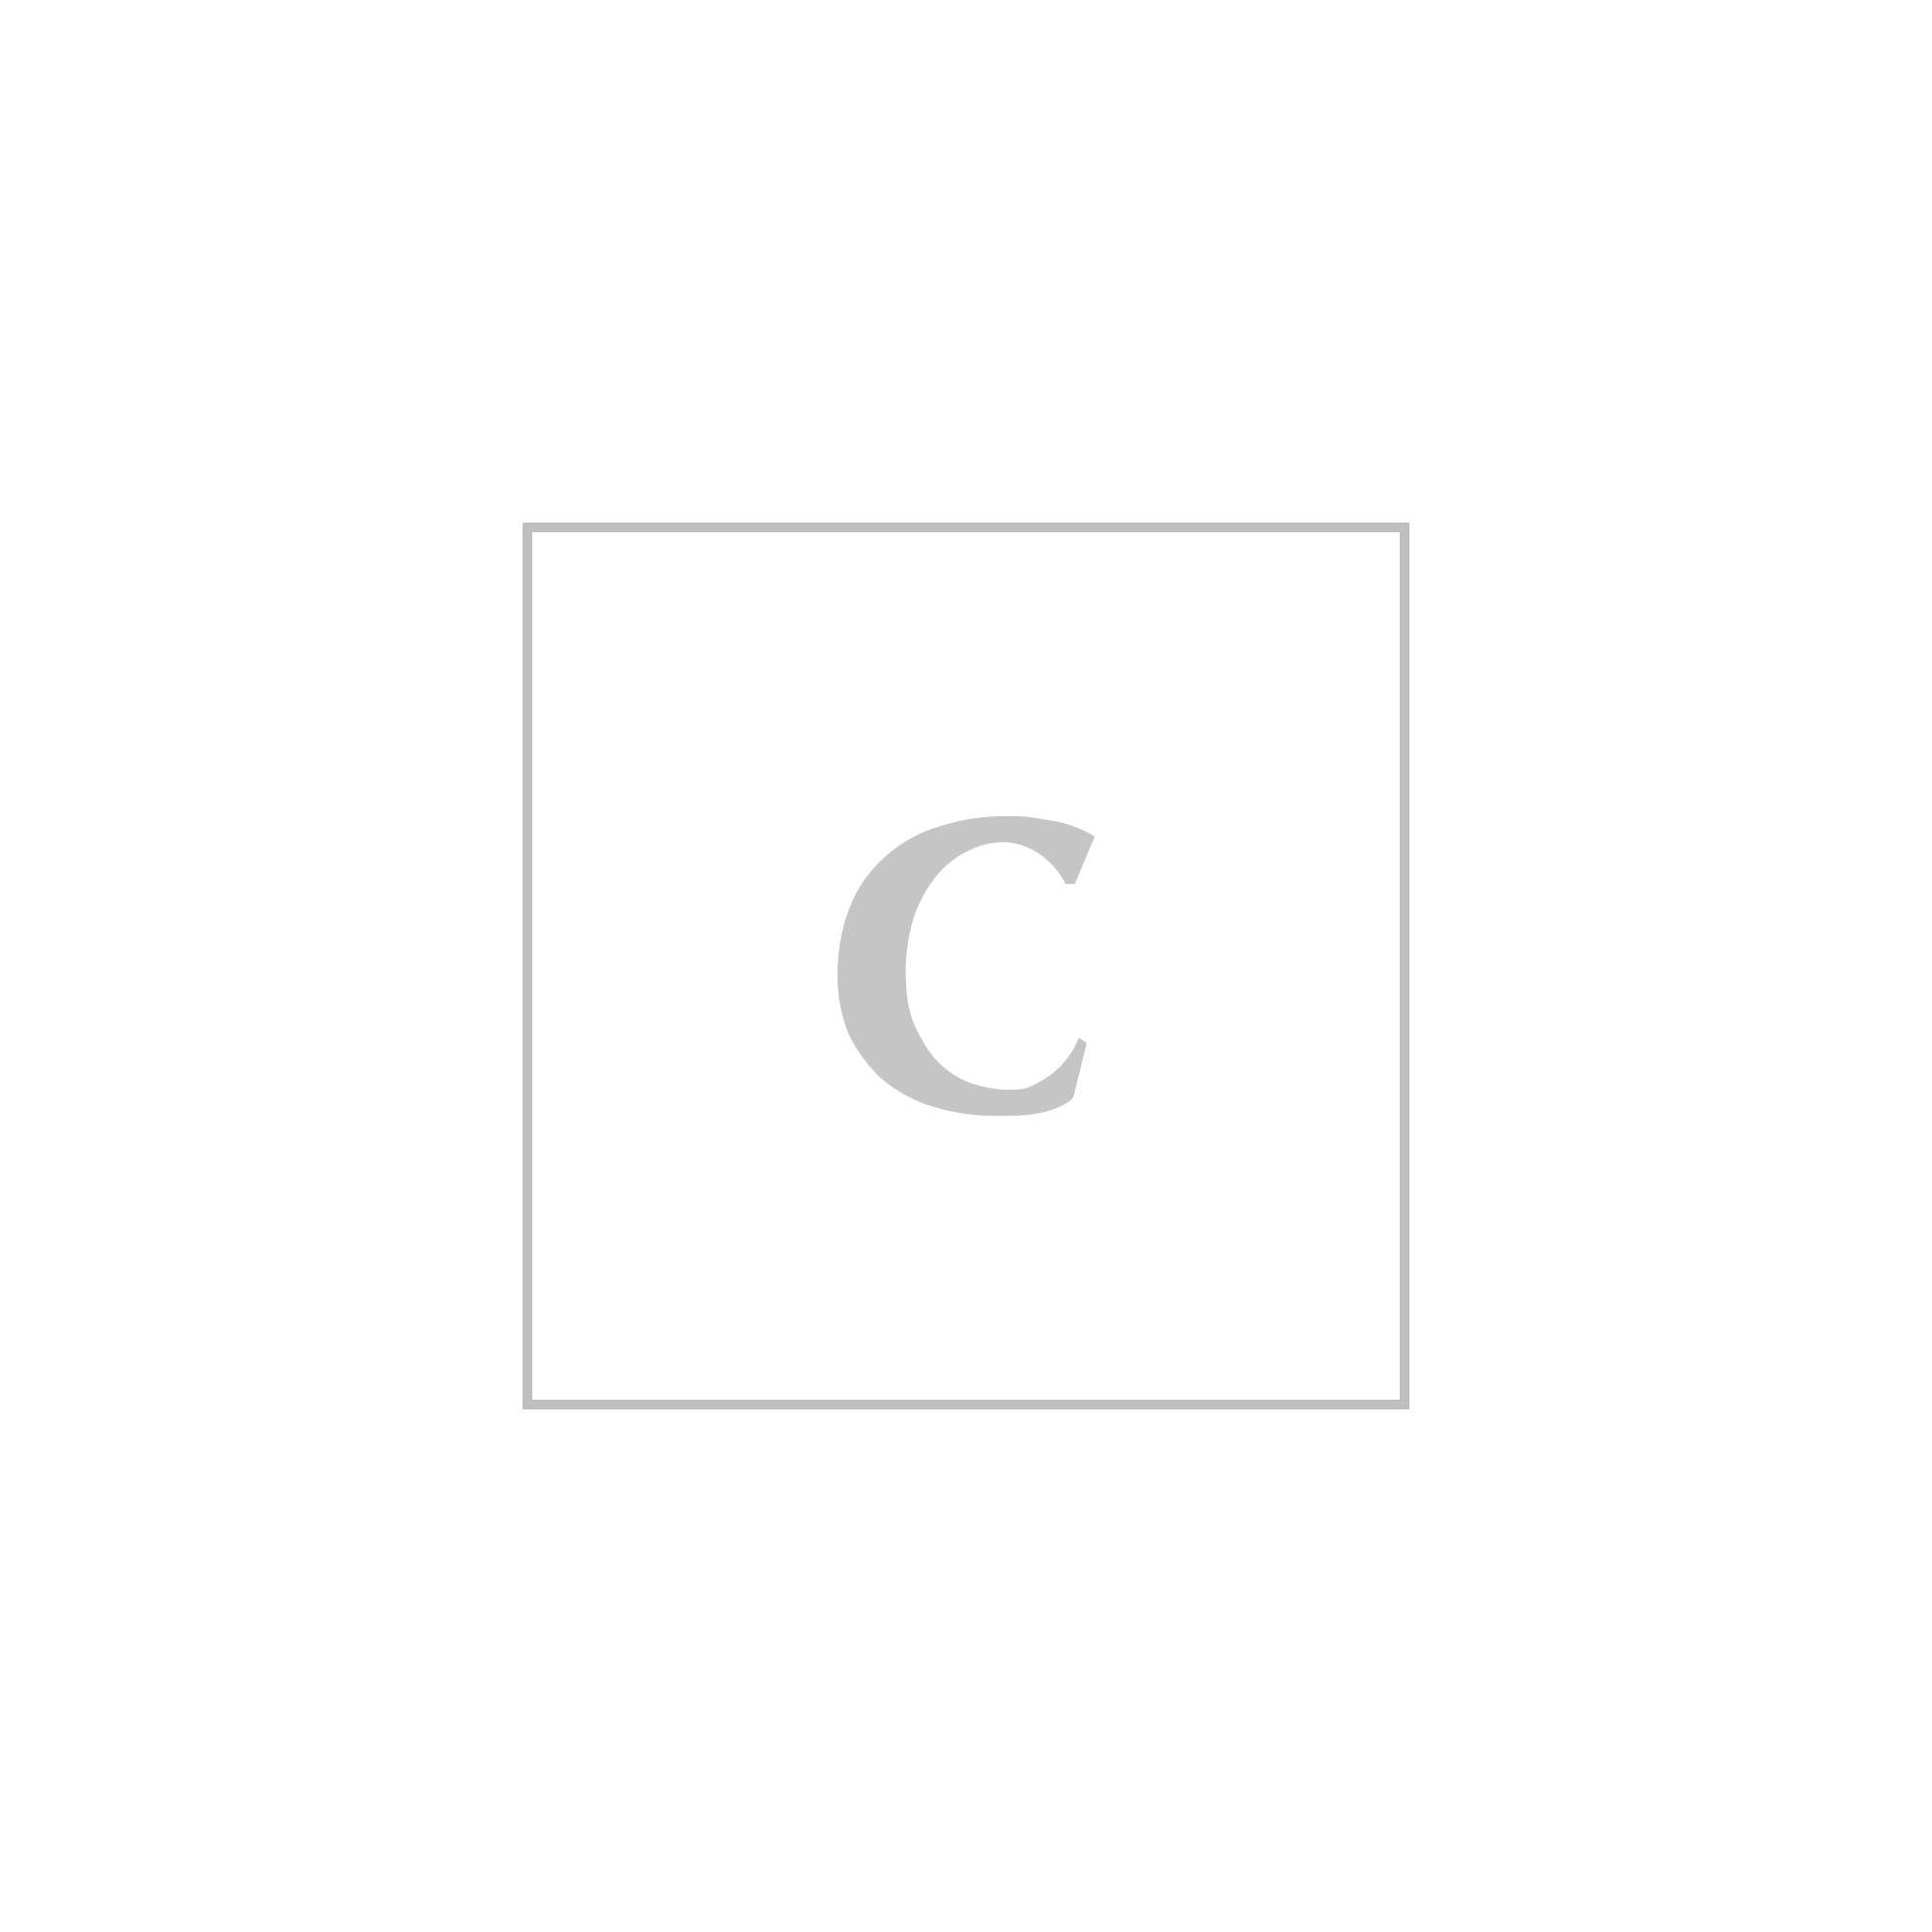 stella mccartney calzature donna stringate elyse logo